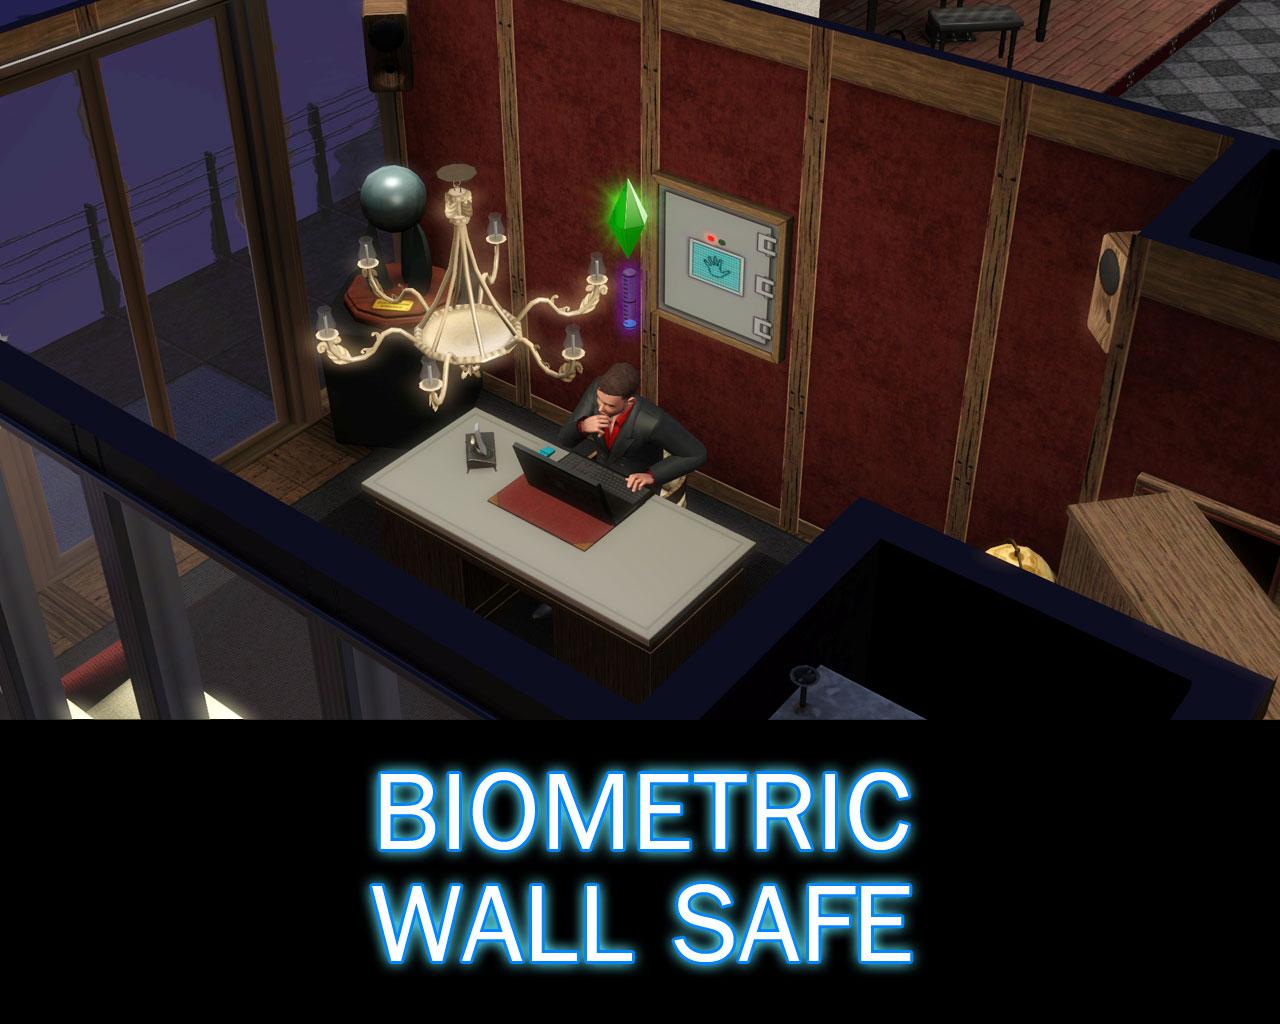 My Sims 3 Blog: Biometric Wall Safe by Simoleon Real Estate